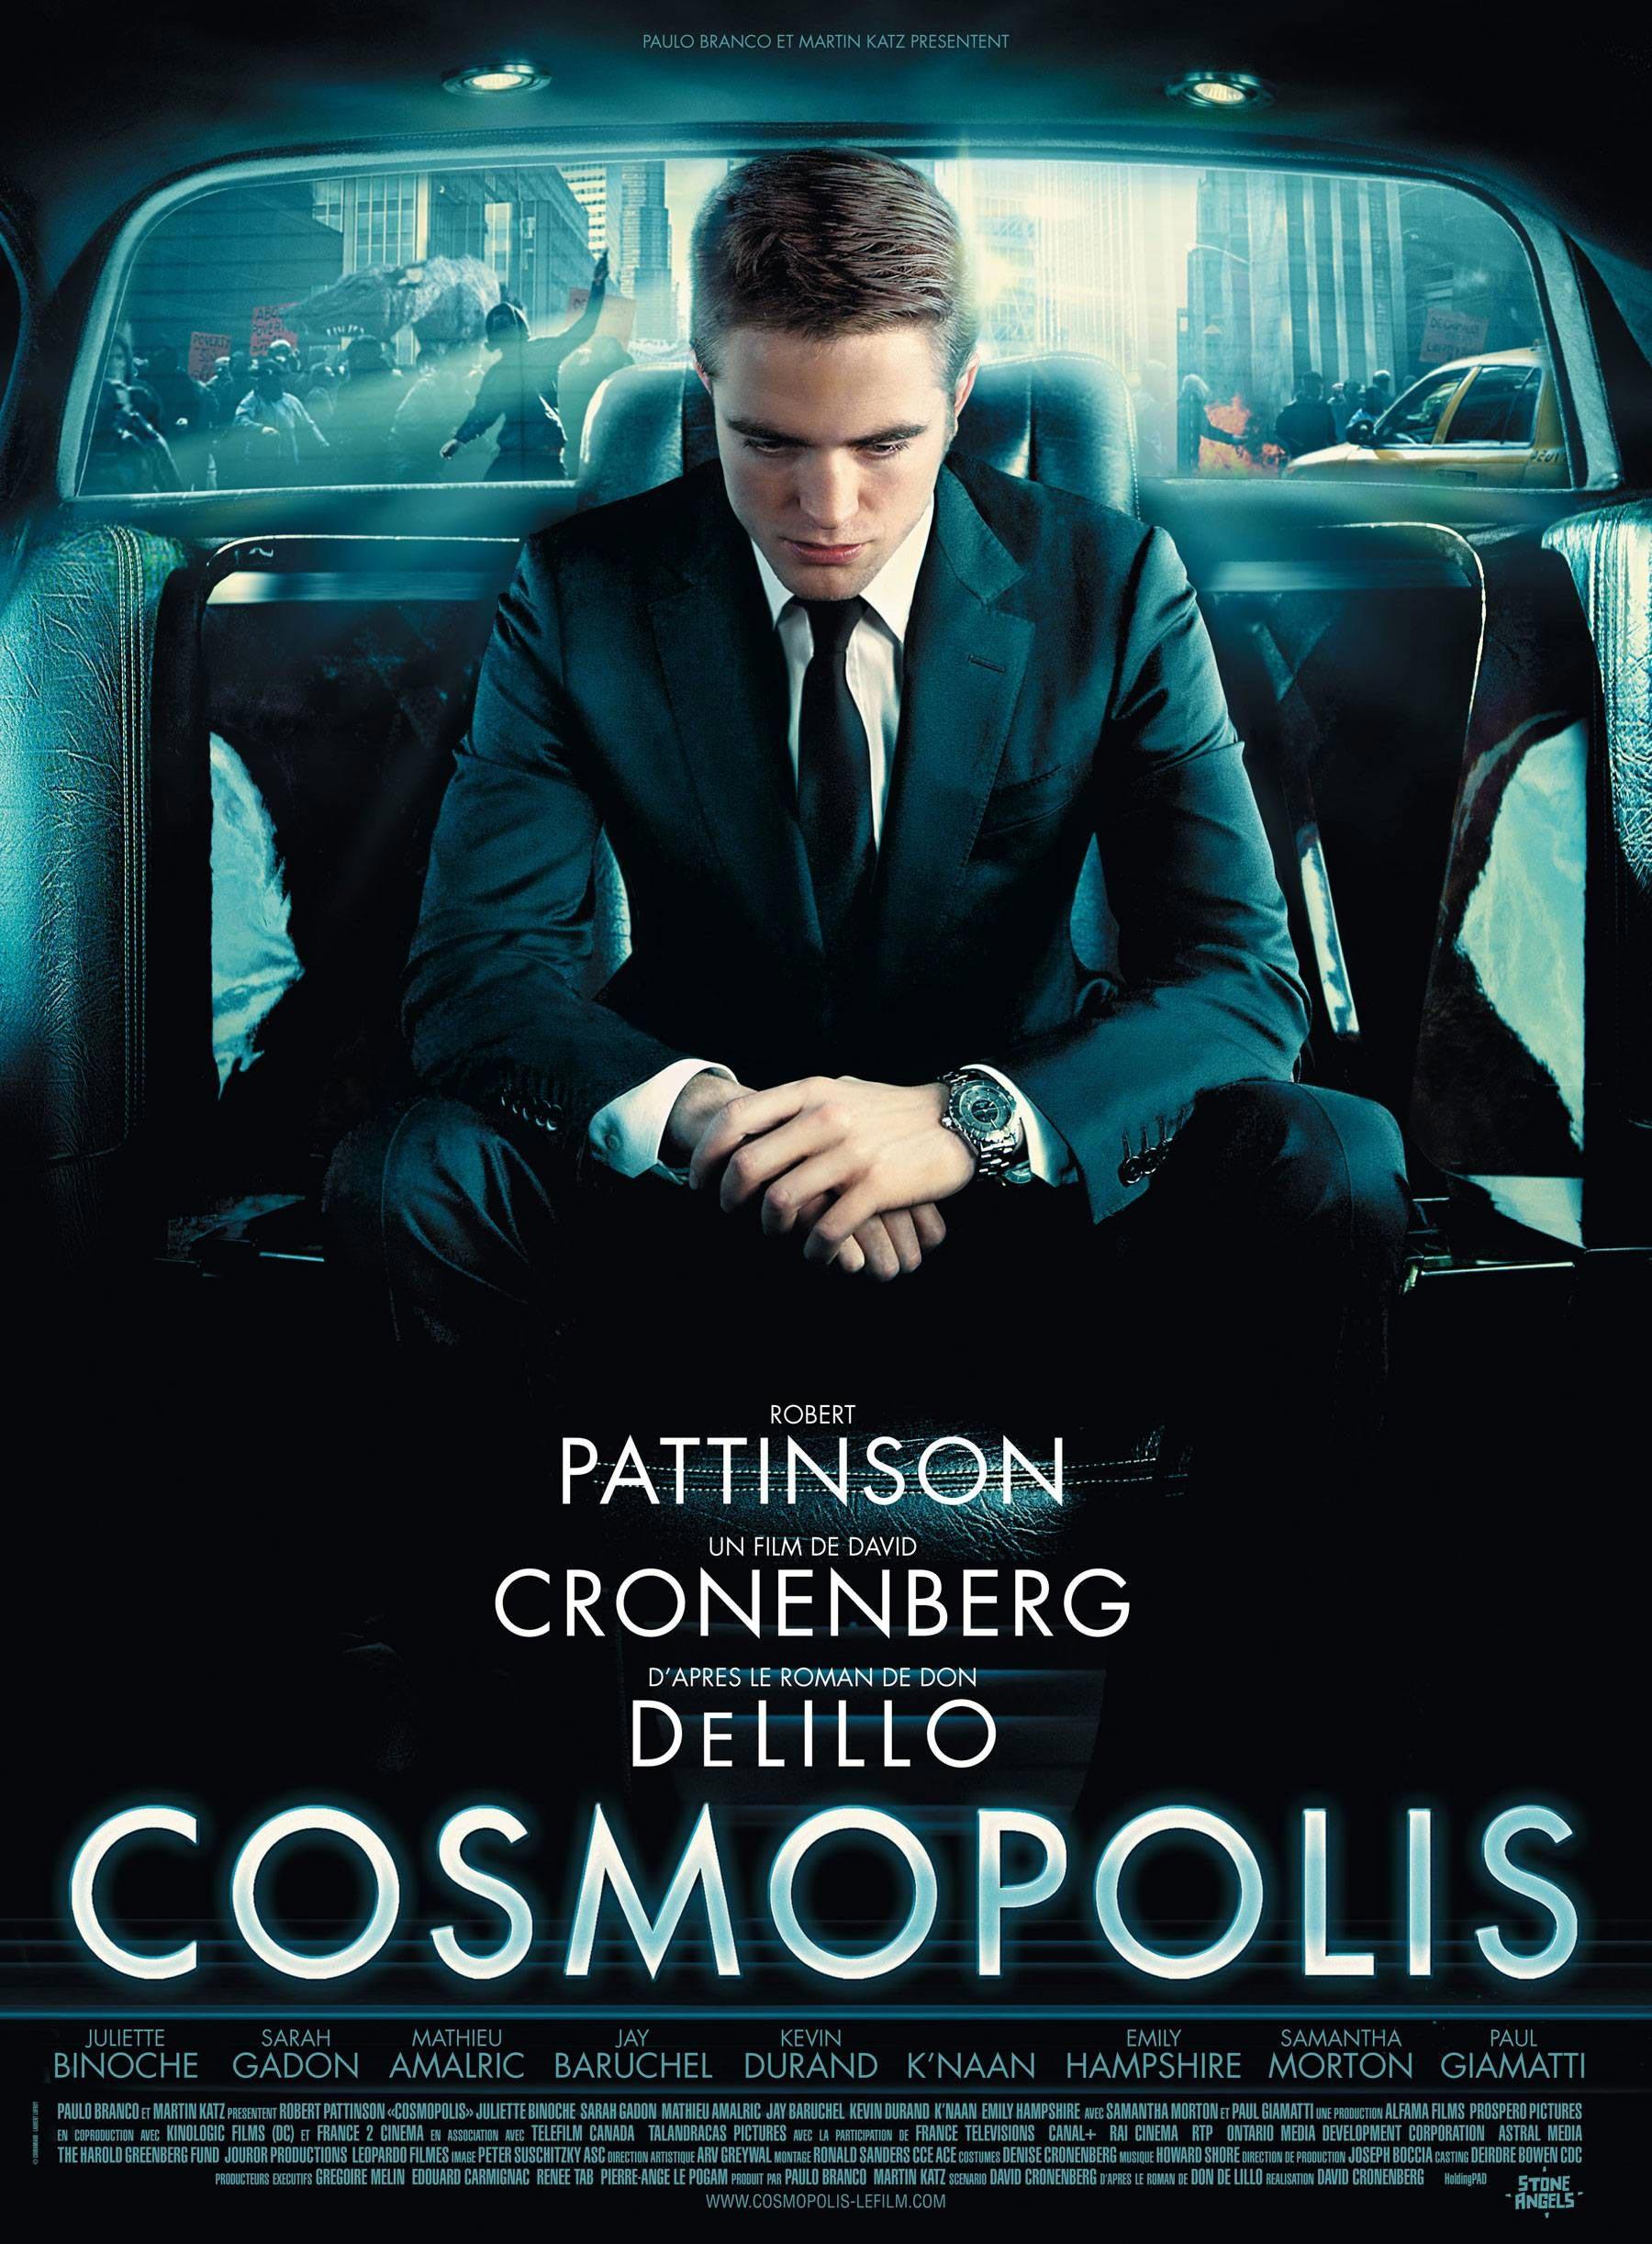 http://www.nomepierdoniuna.net/wp-content/uploads/Cosmopolis-Poster.jpg